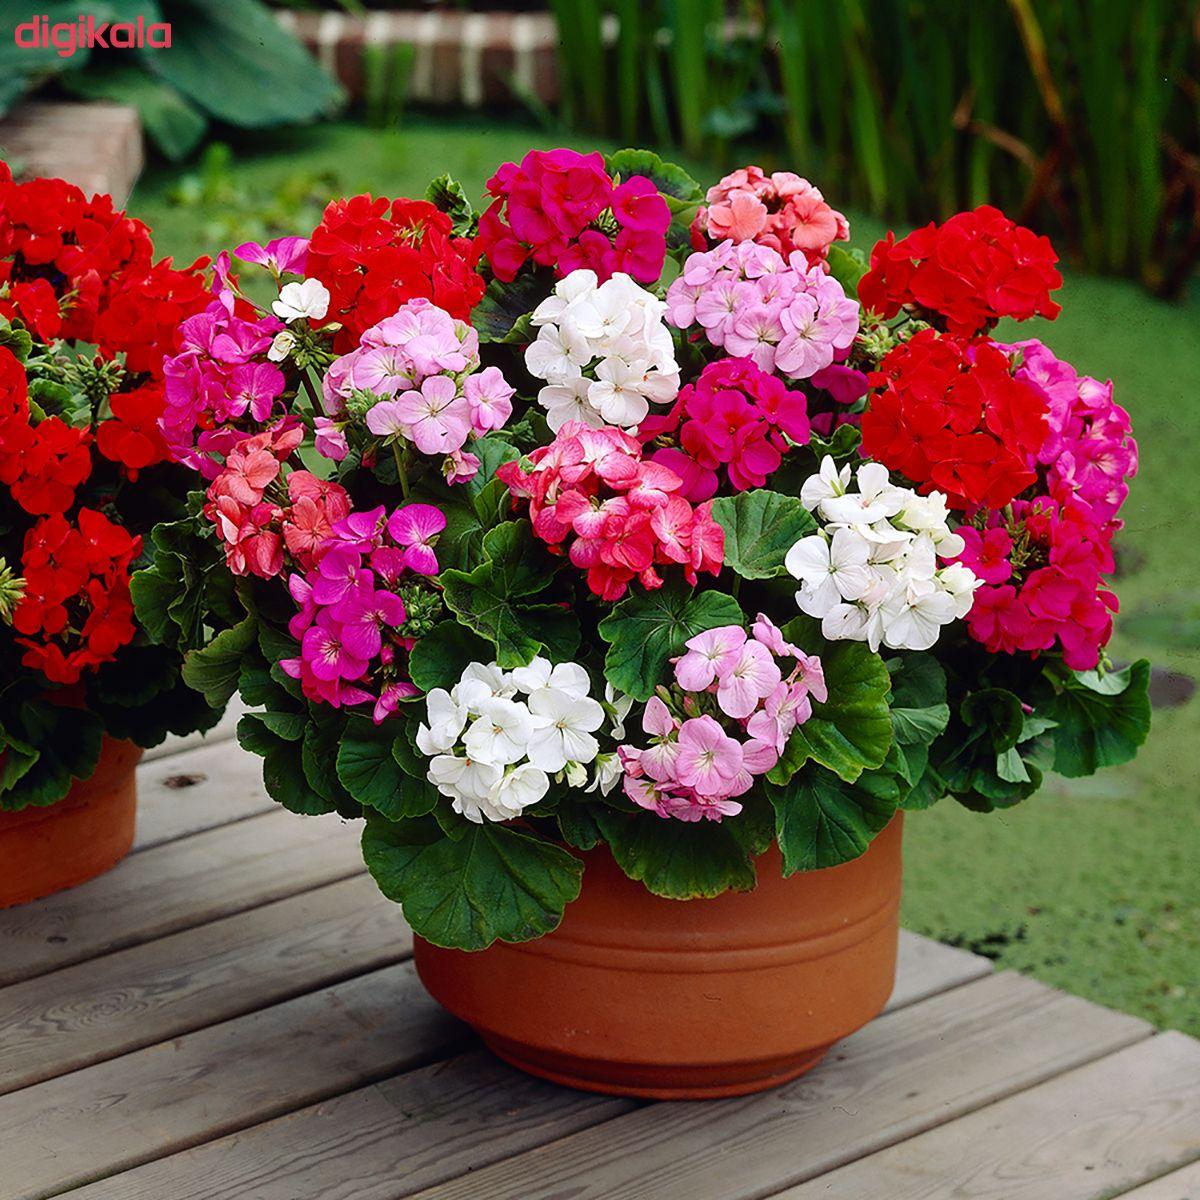 بذر گل شمعدانی پاکوتاه الوان وانیا سید مدل N76 main 1 2